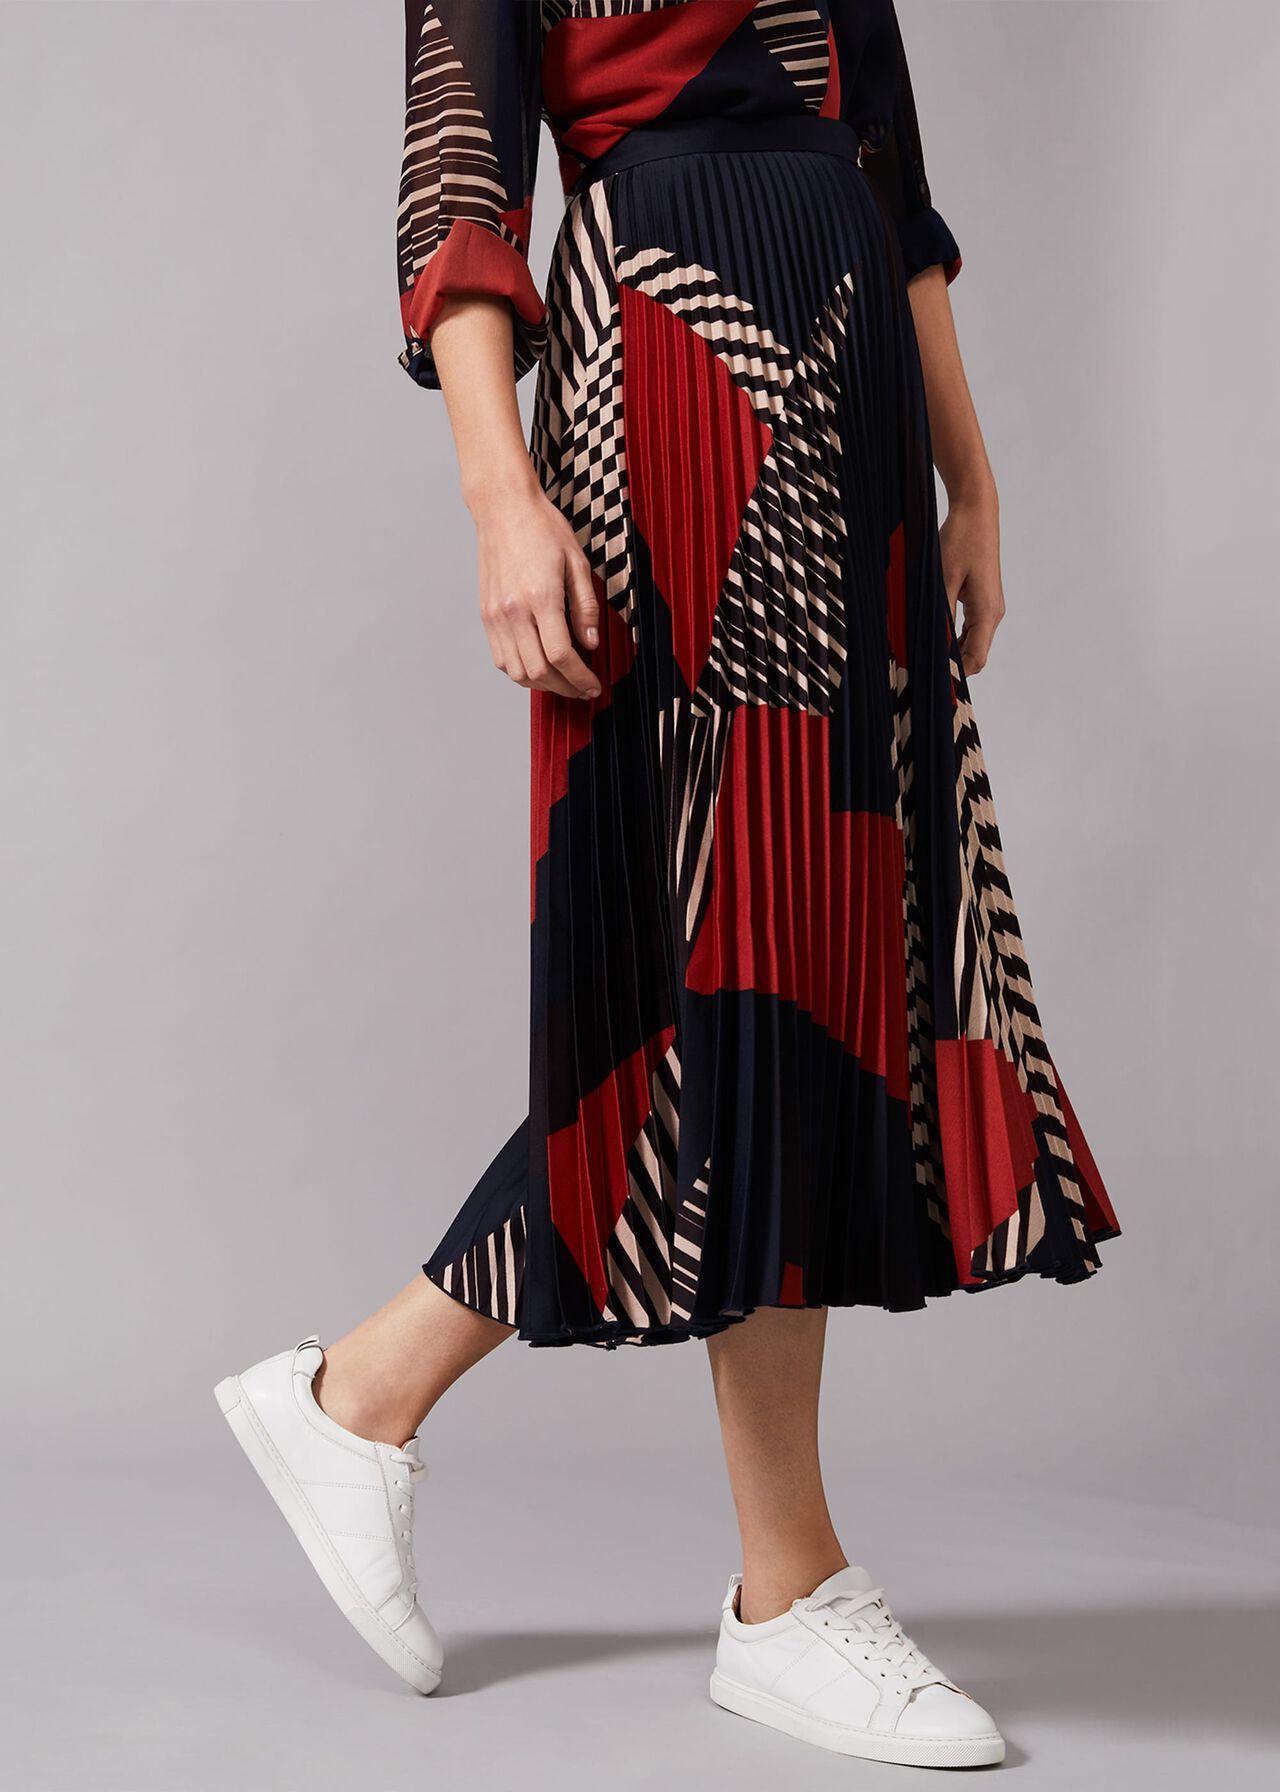 Clarice Print Pleated Skirt